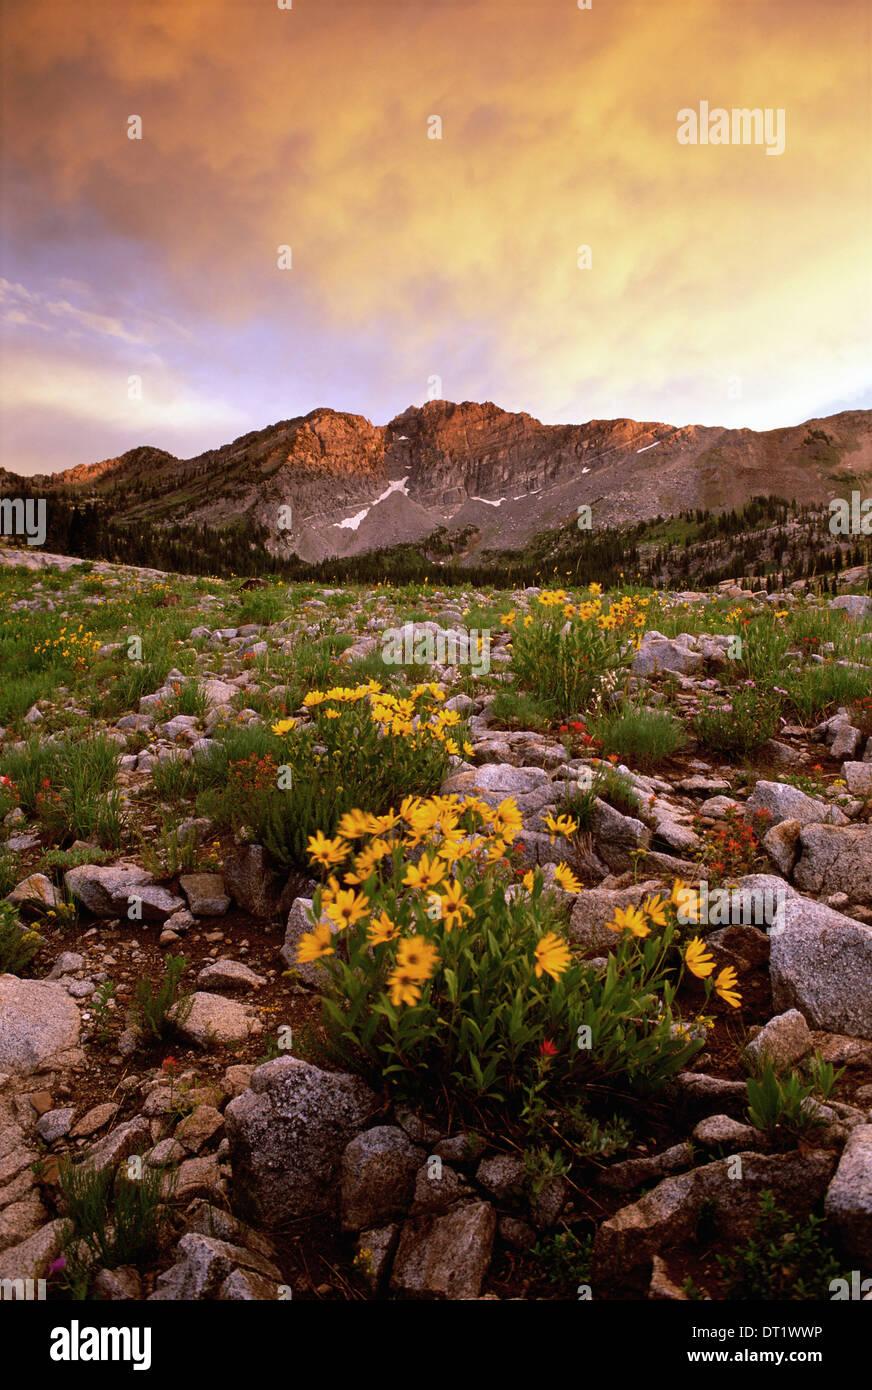 Paisaje de Little Cottonwood Canyon con el Devil's Castle el pico de la montaña en la cordillera Wasatch flores silvestres Sunset Imagen De Stock